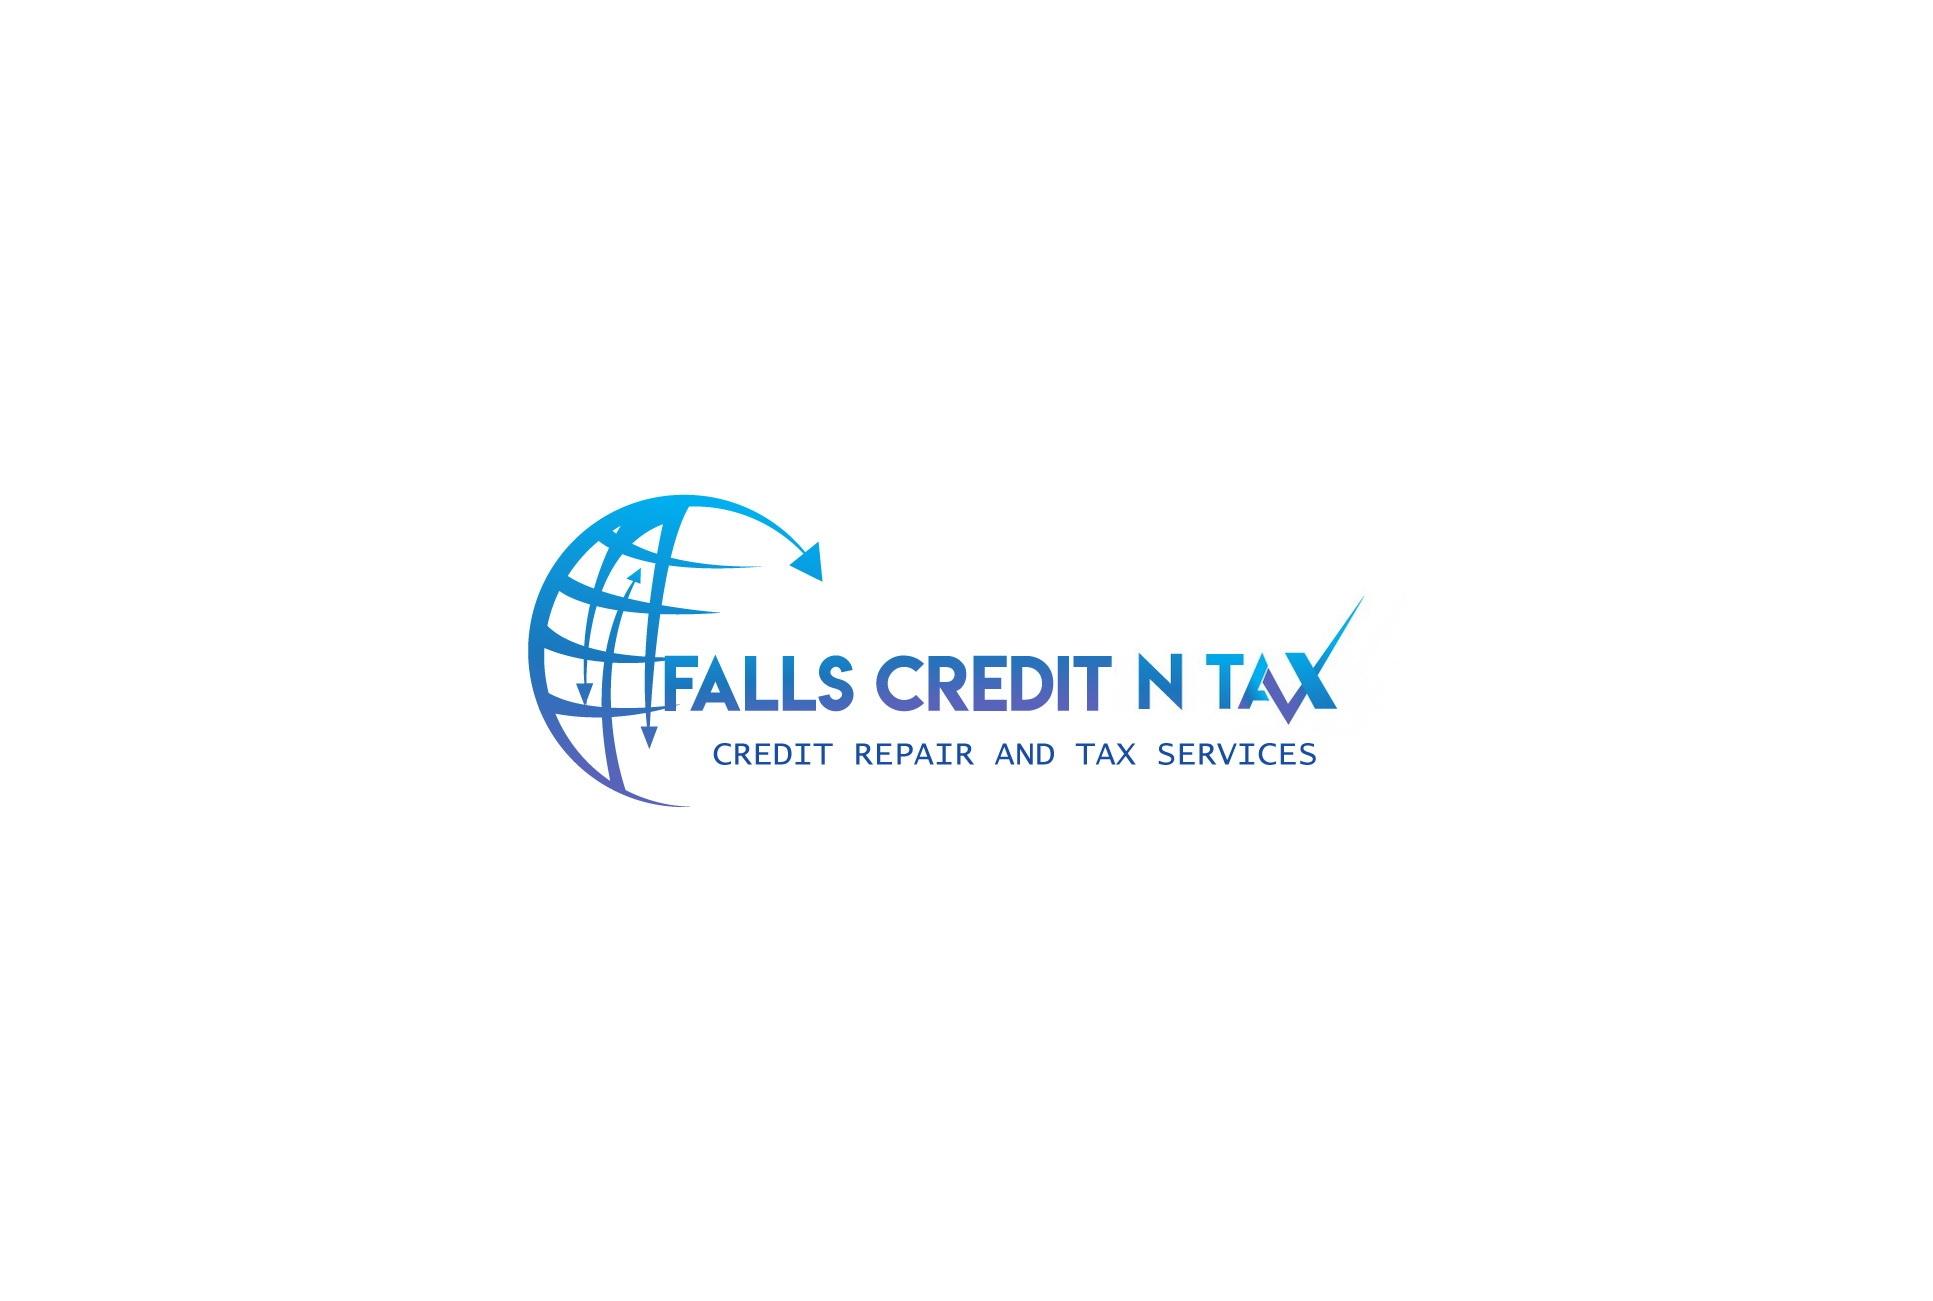 Falls Credit N Tax (@fallscreditntax) Cover Image